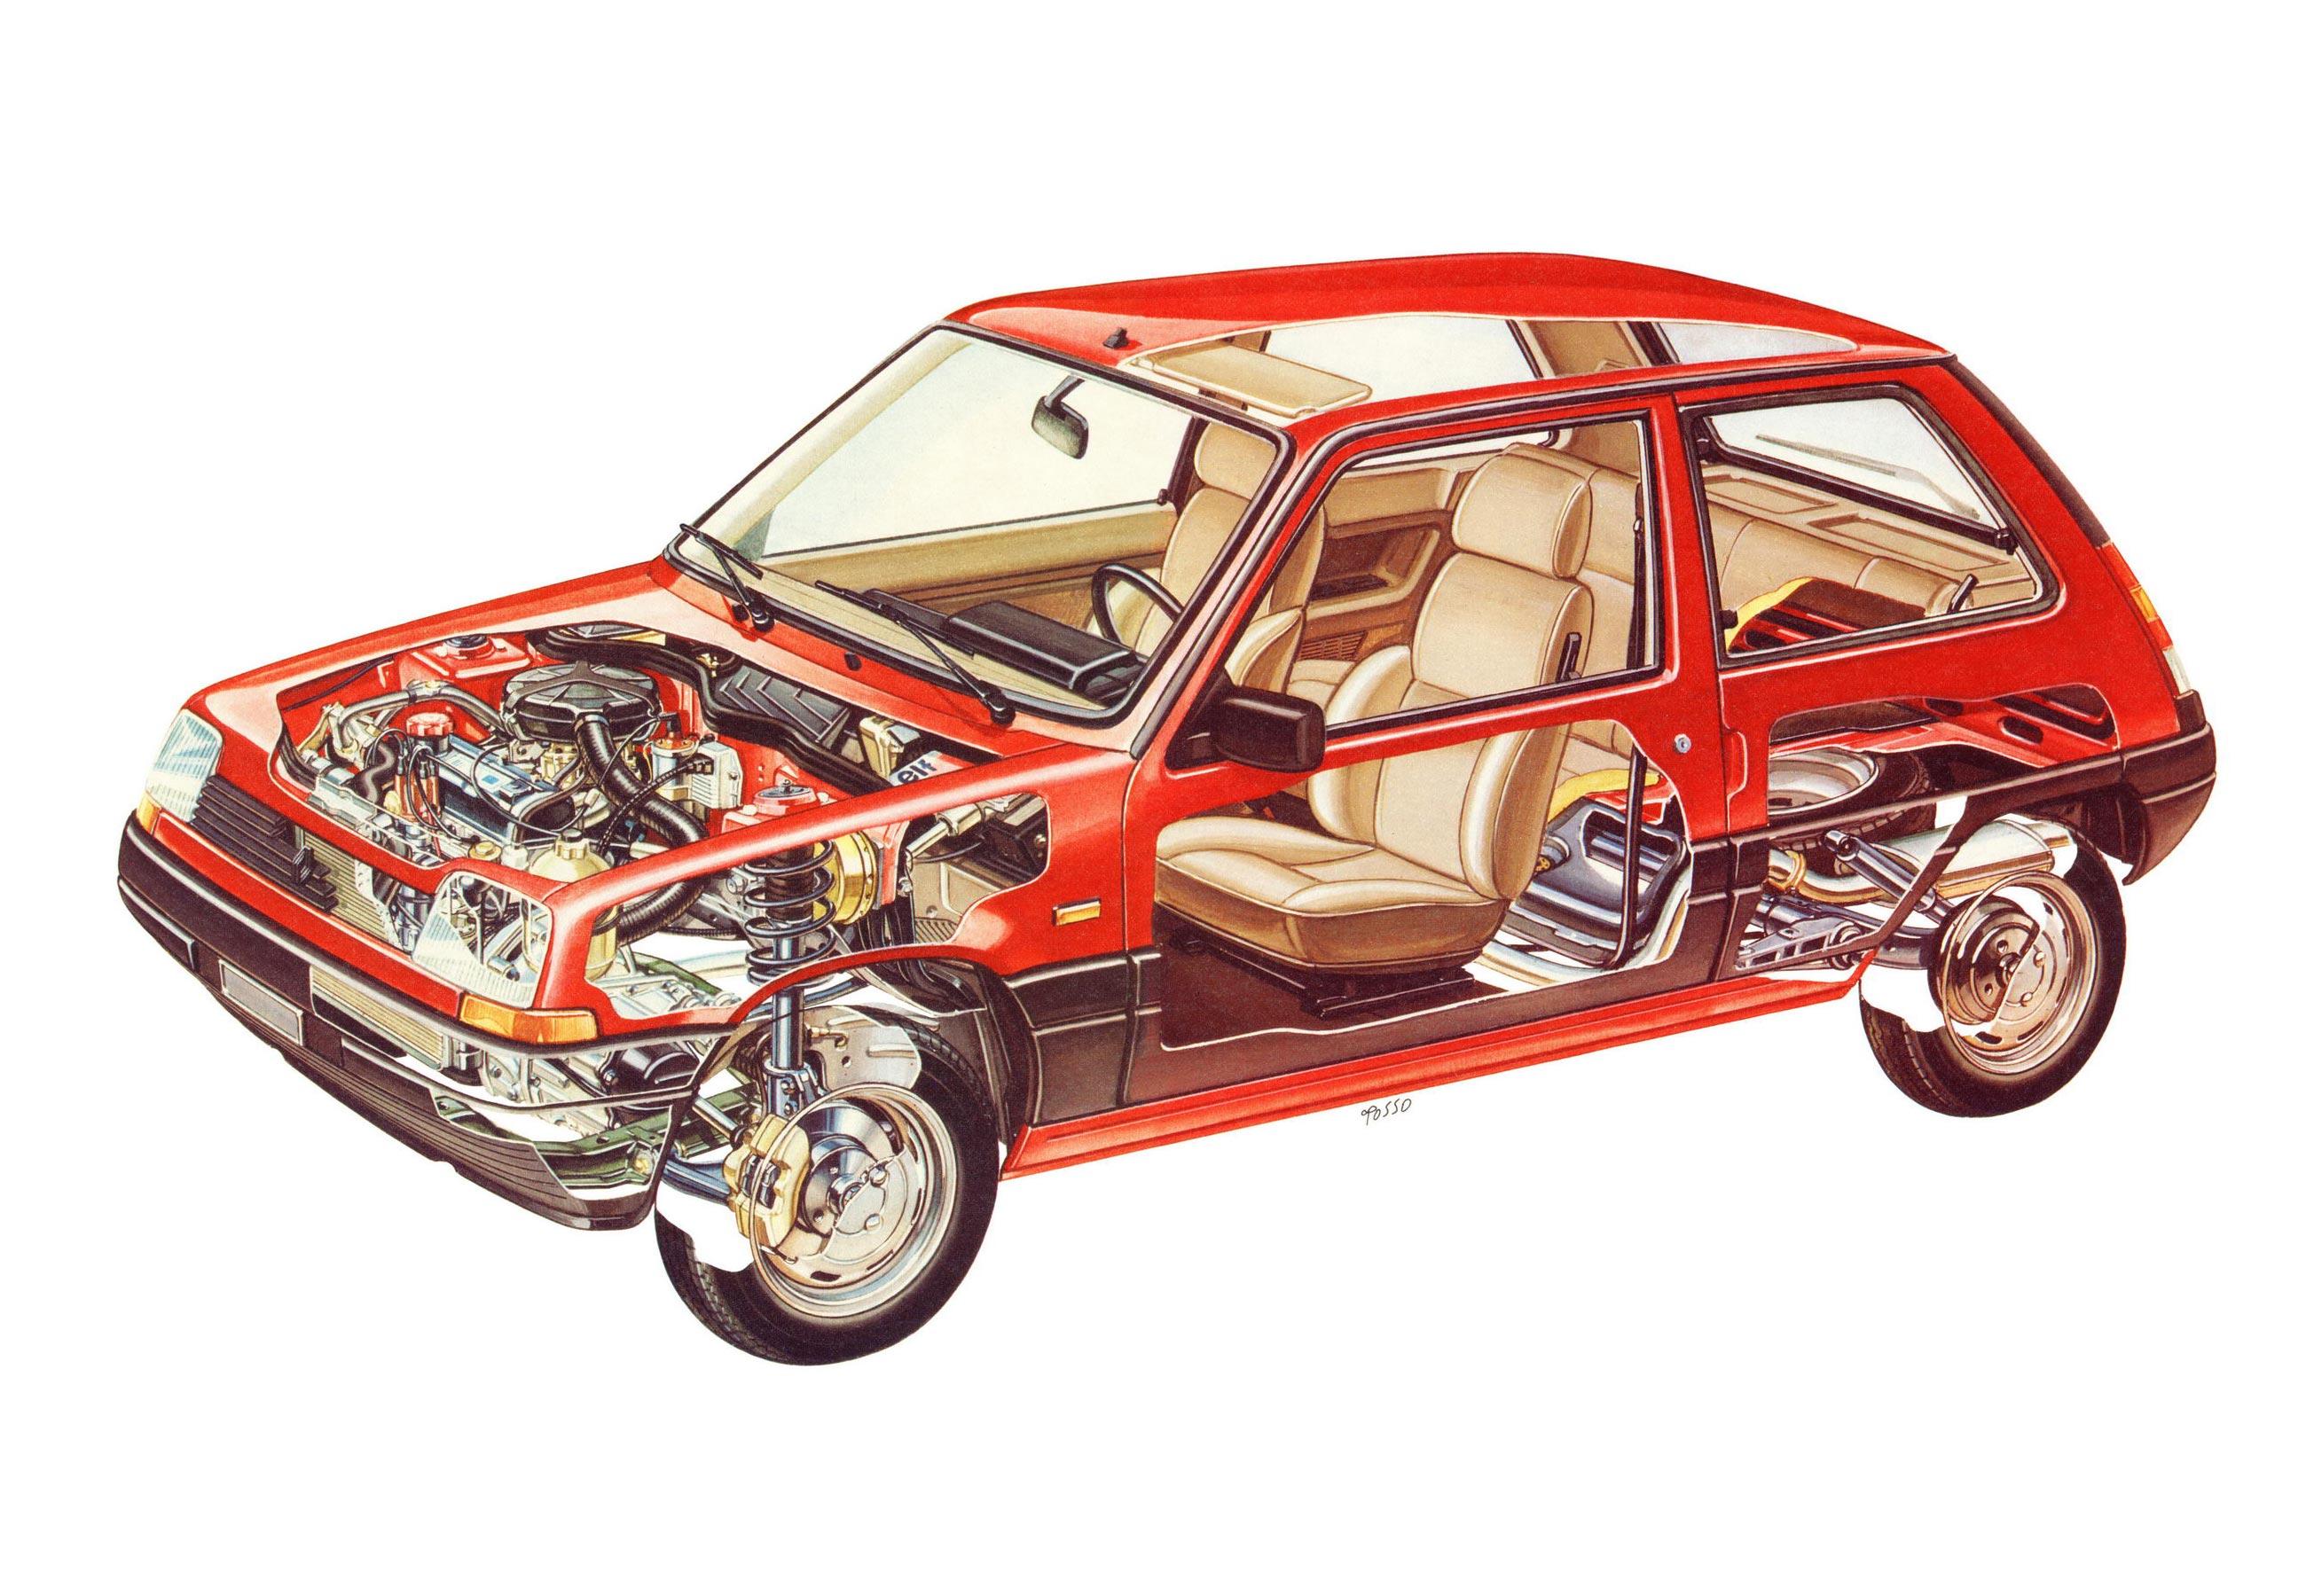 Renault 5 cutaway drawing